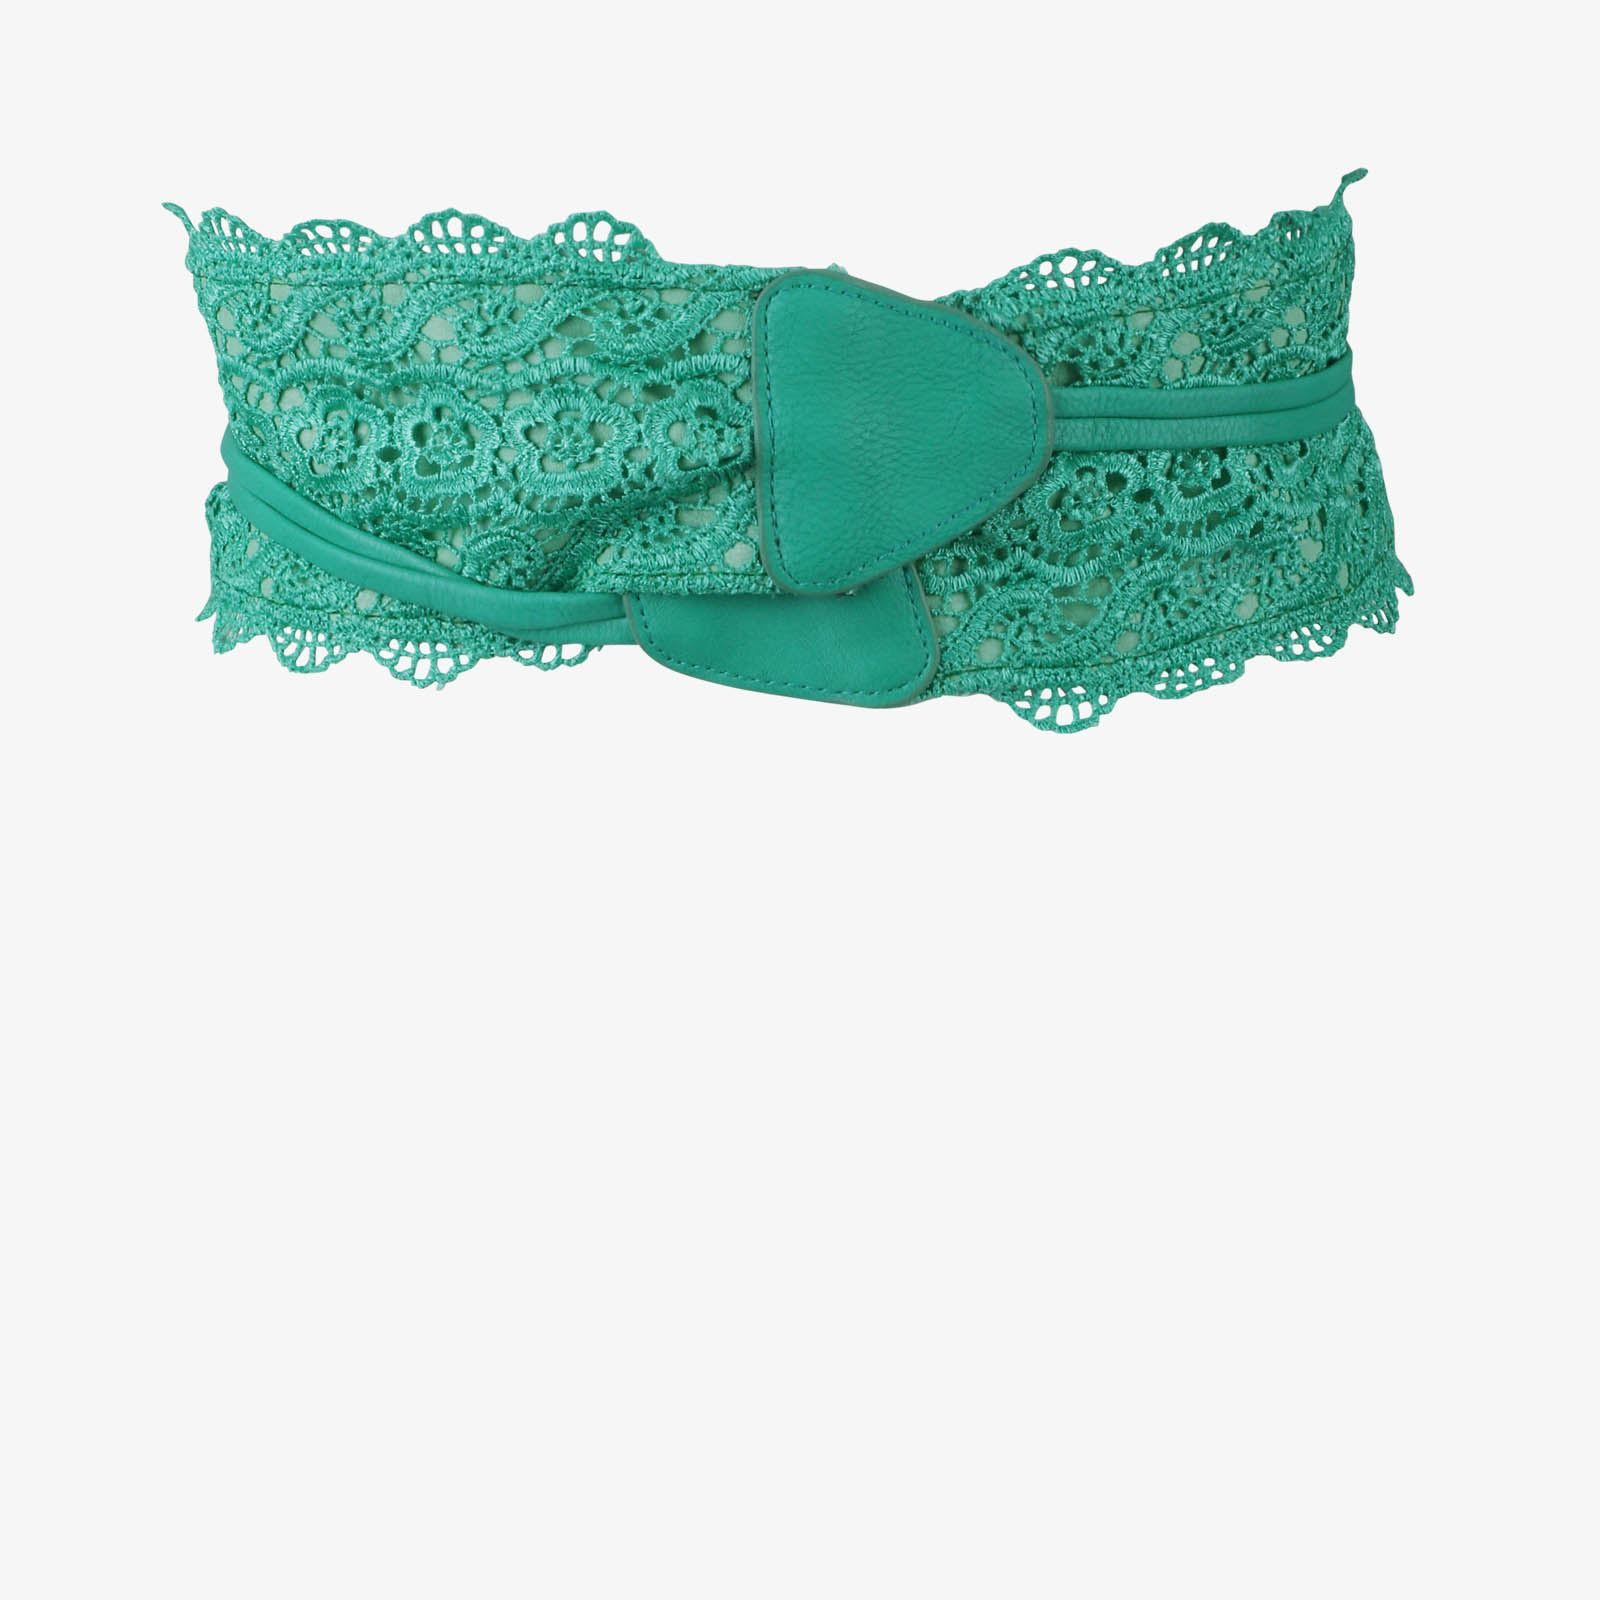 thumbnail 27 - Womens-Ladies-Wide-Waist-Belt-Floral-Waistband-Pattern-Band-Crochet-Lace-Corset